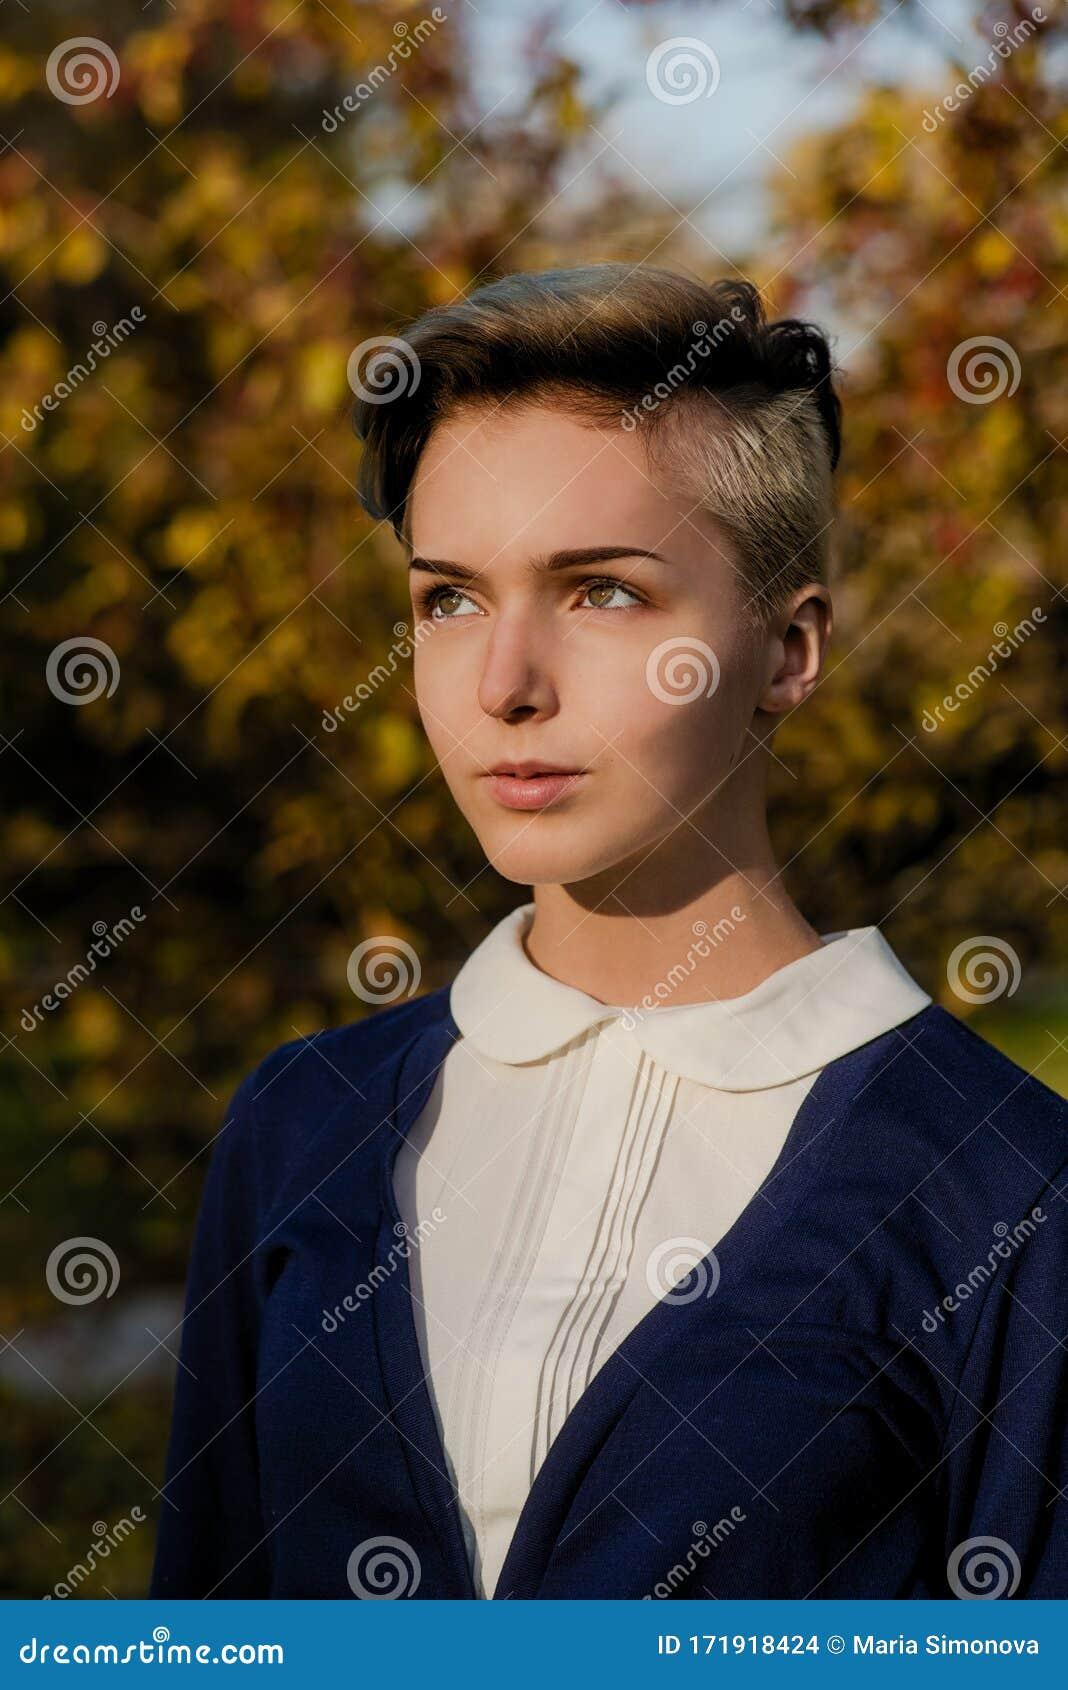 4 759 Teen Girl Short Hair Photos Free Royalty Free Stock Photos From Dreamstime